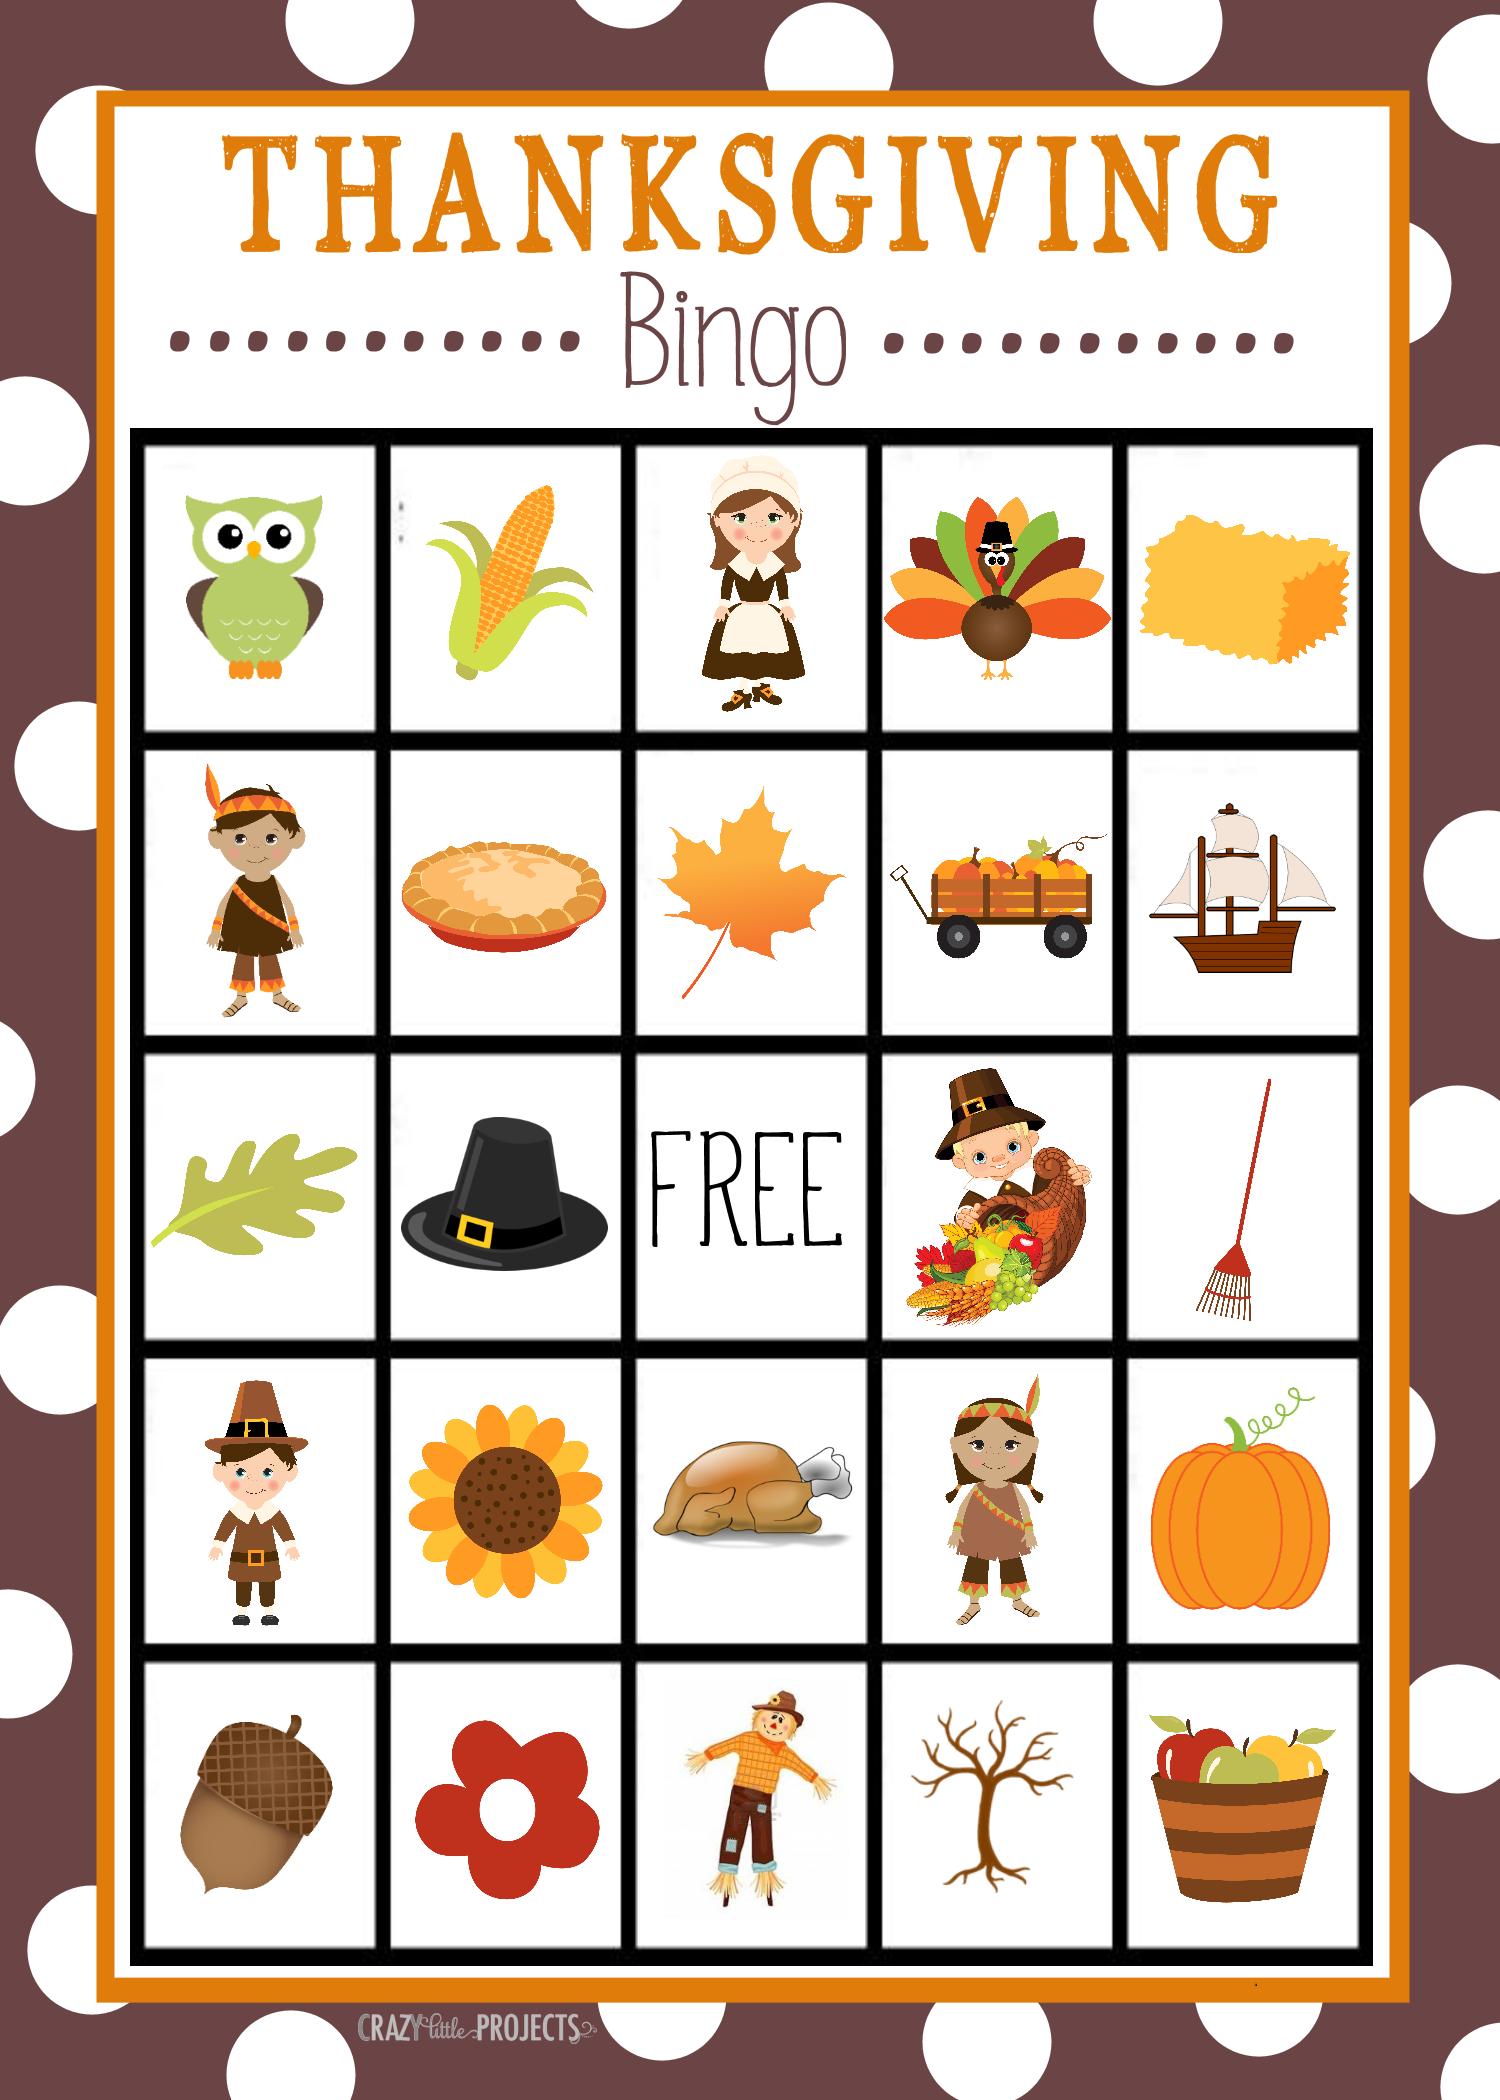 Bingo clipart turkey. Clipartxtras thanksgiving